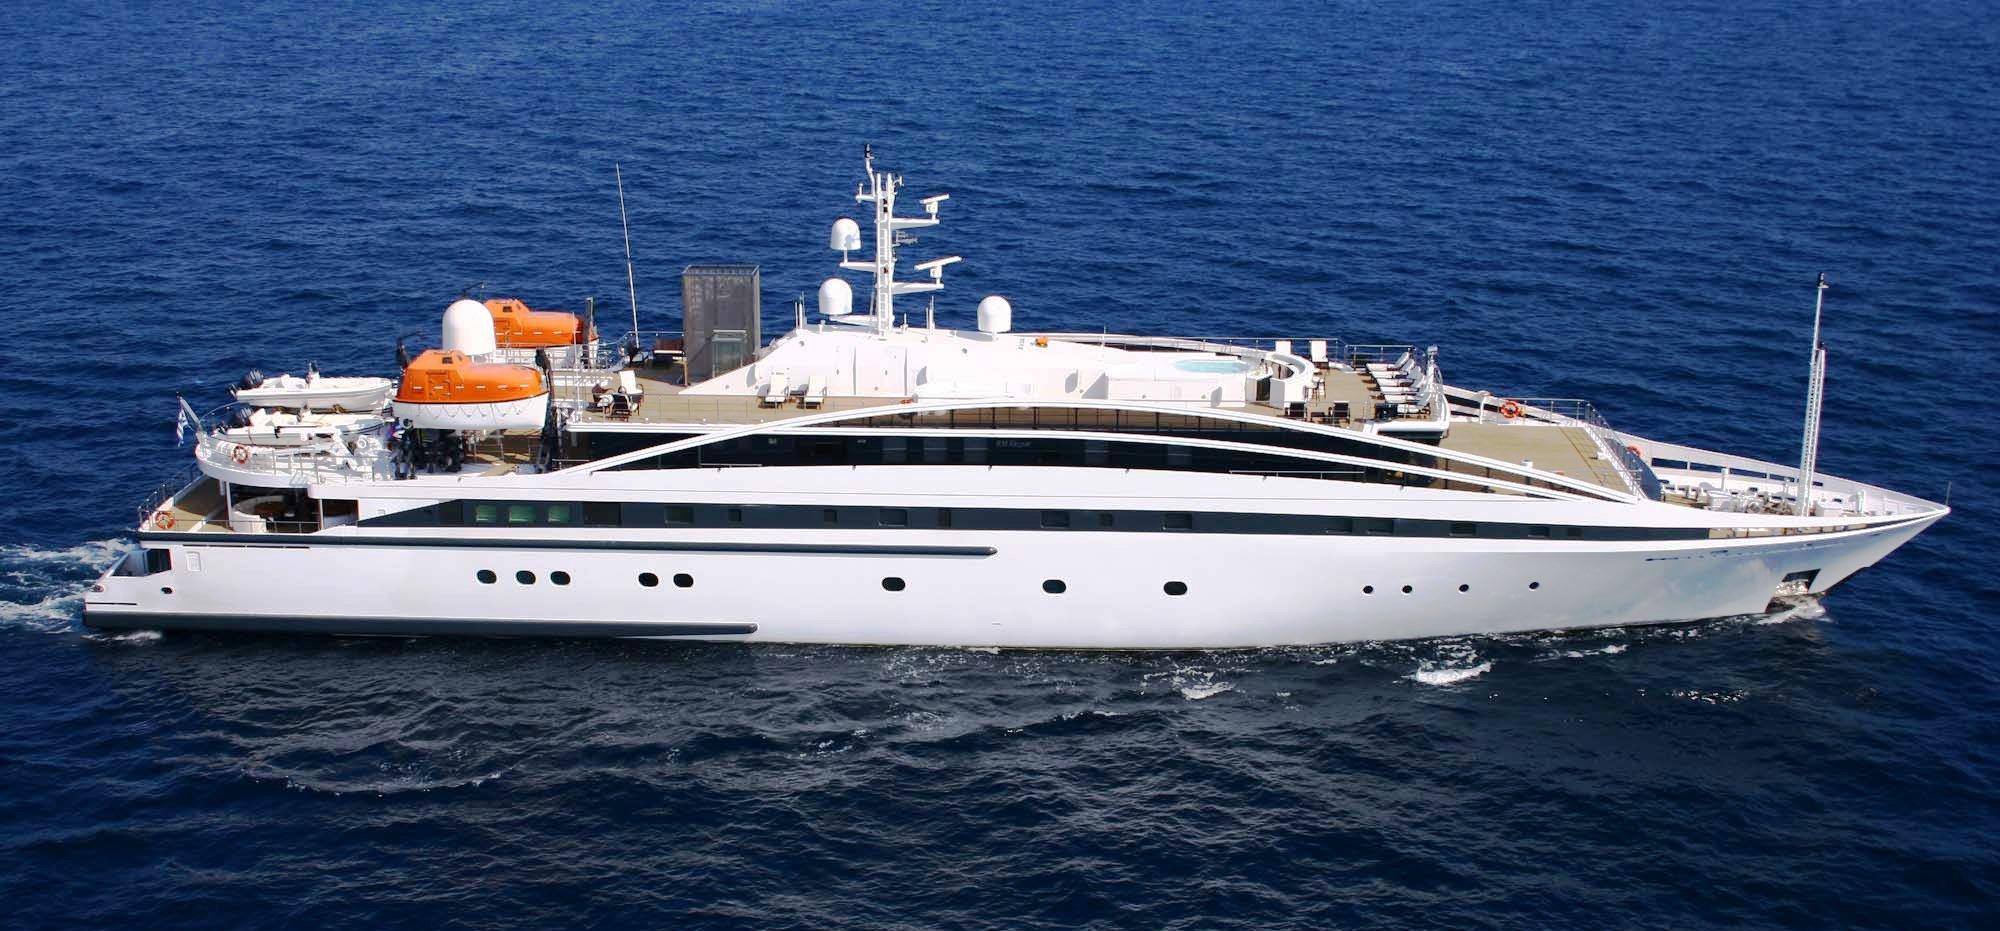 Motor Yacht Rm Elegant Yacht Charter Superyacht News